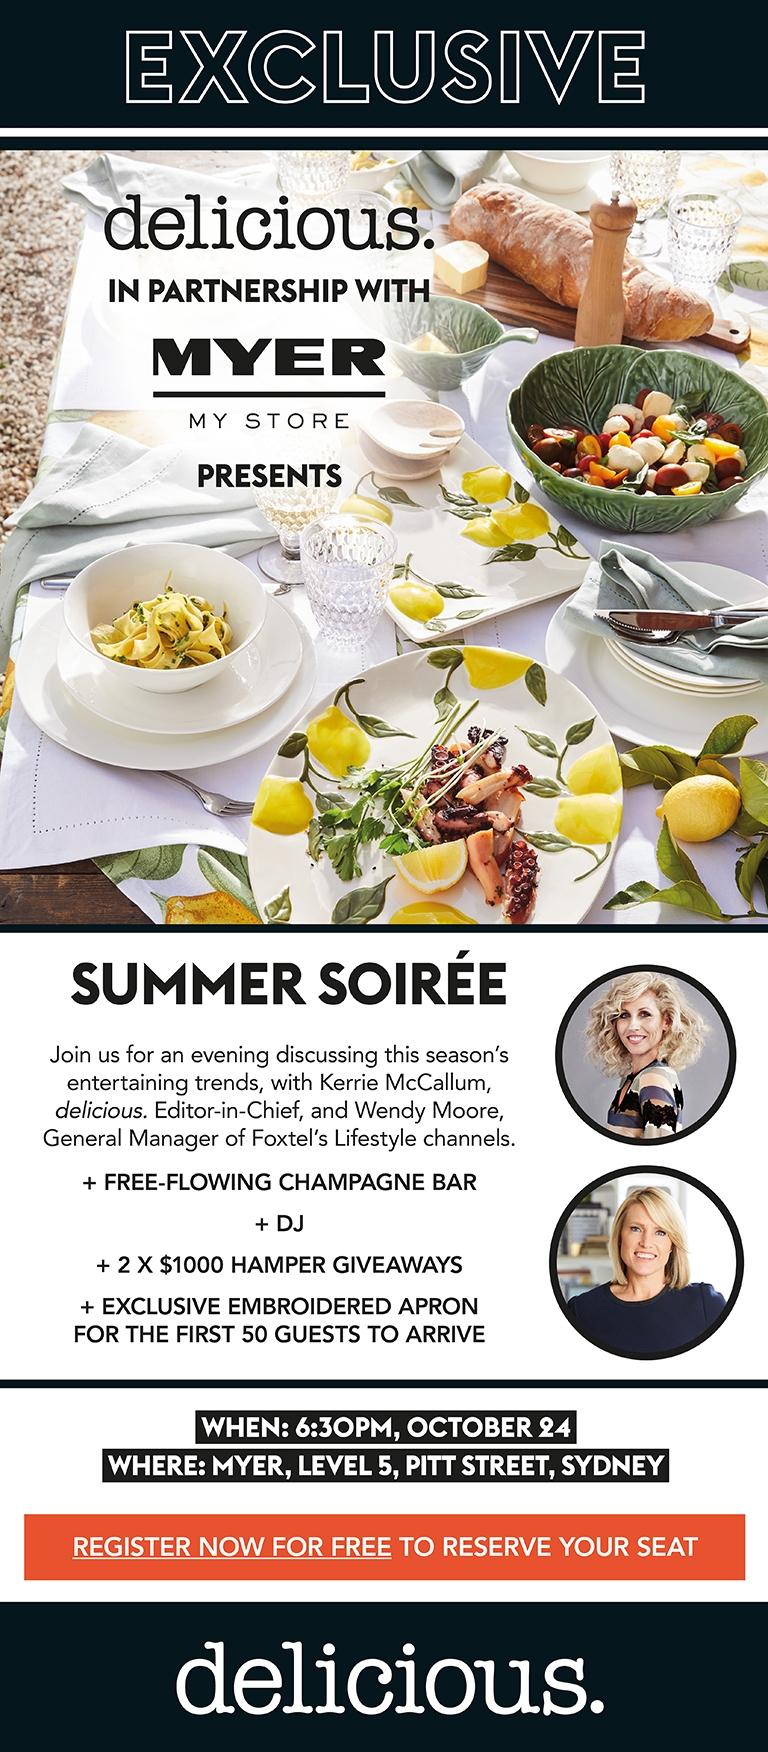 Myer x delicious - Summer Soirée